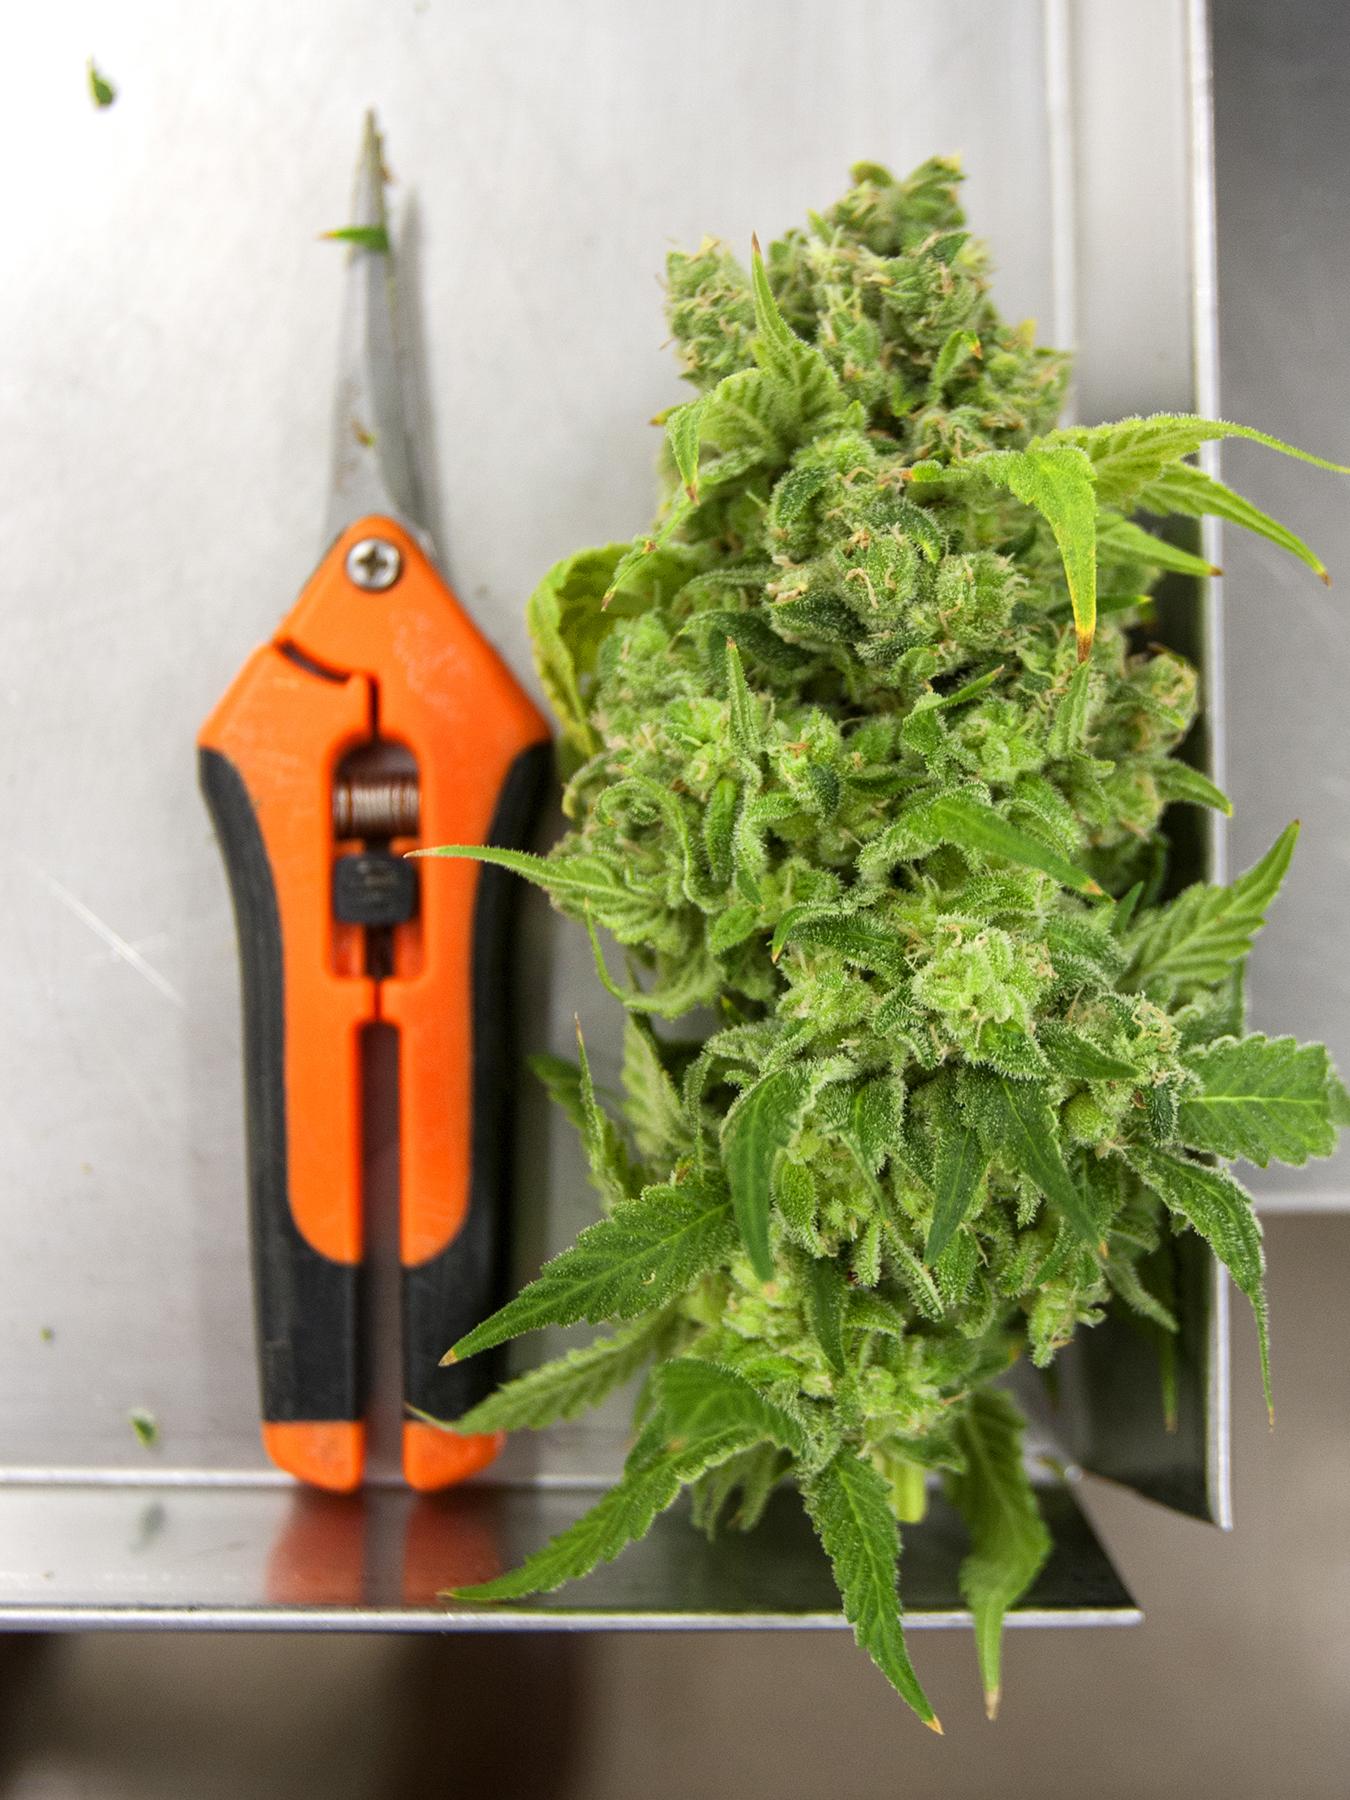 Edison Line hand-trimmed cannabis flower from Organigram